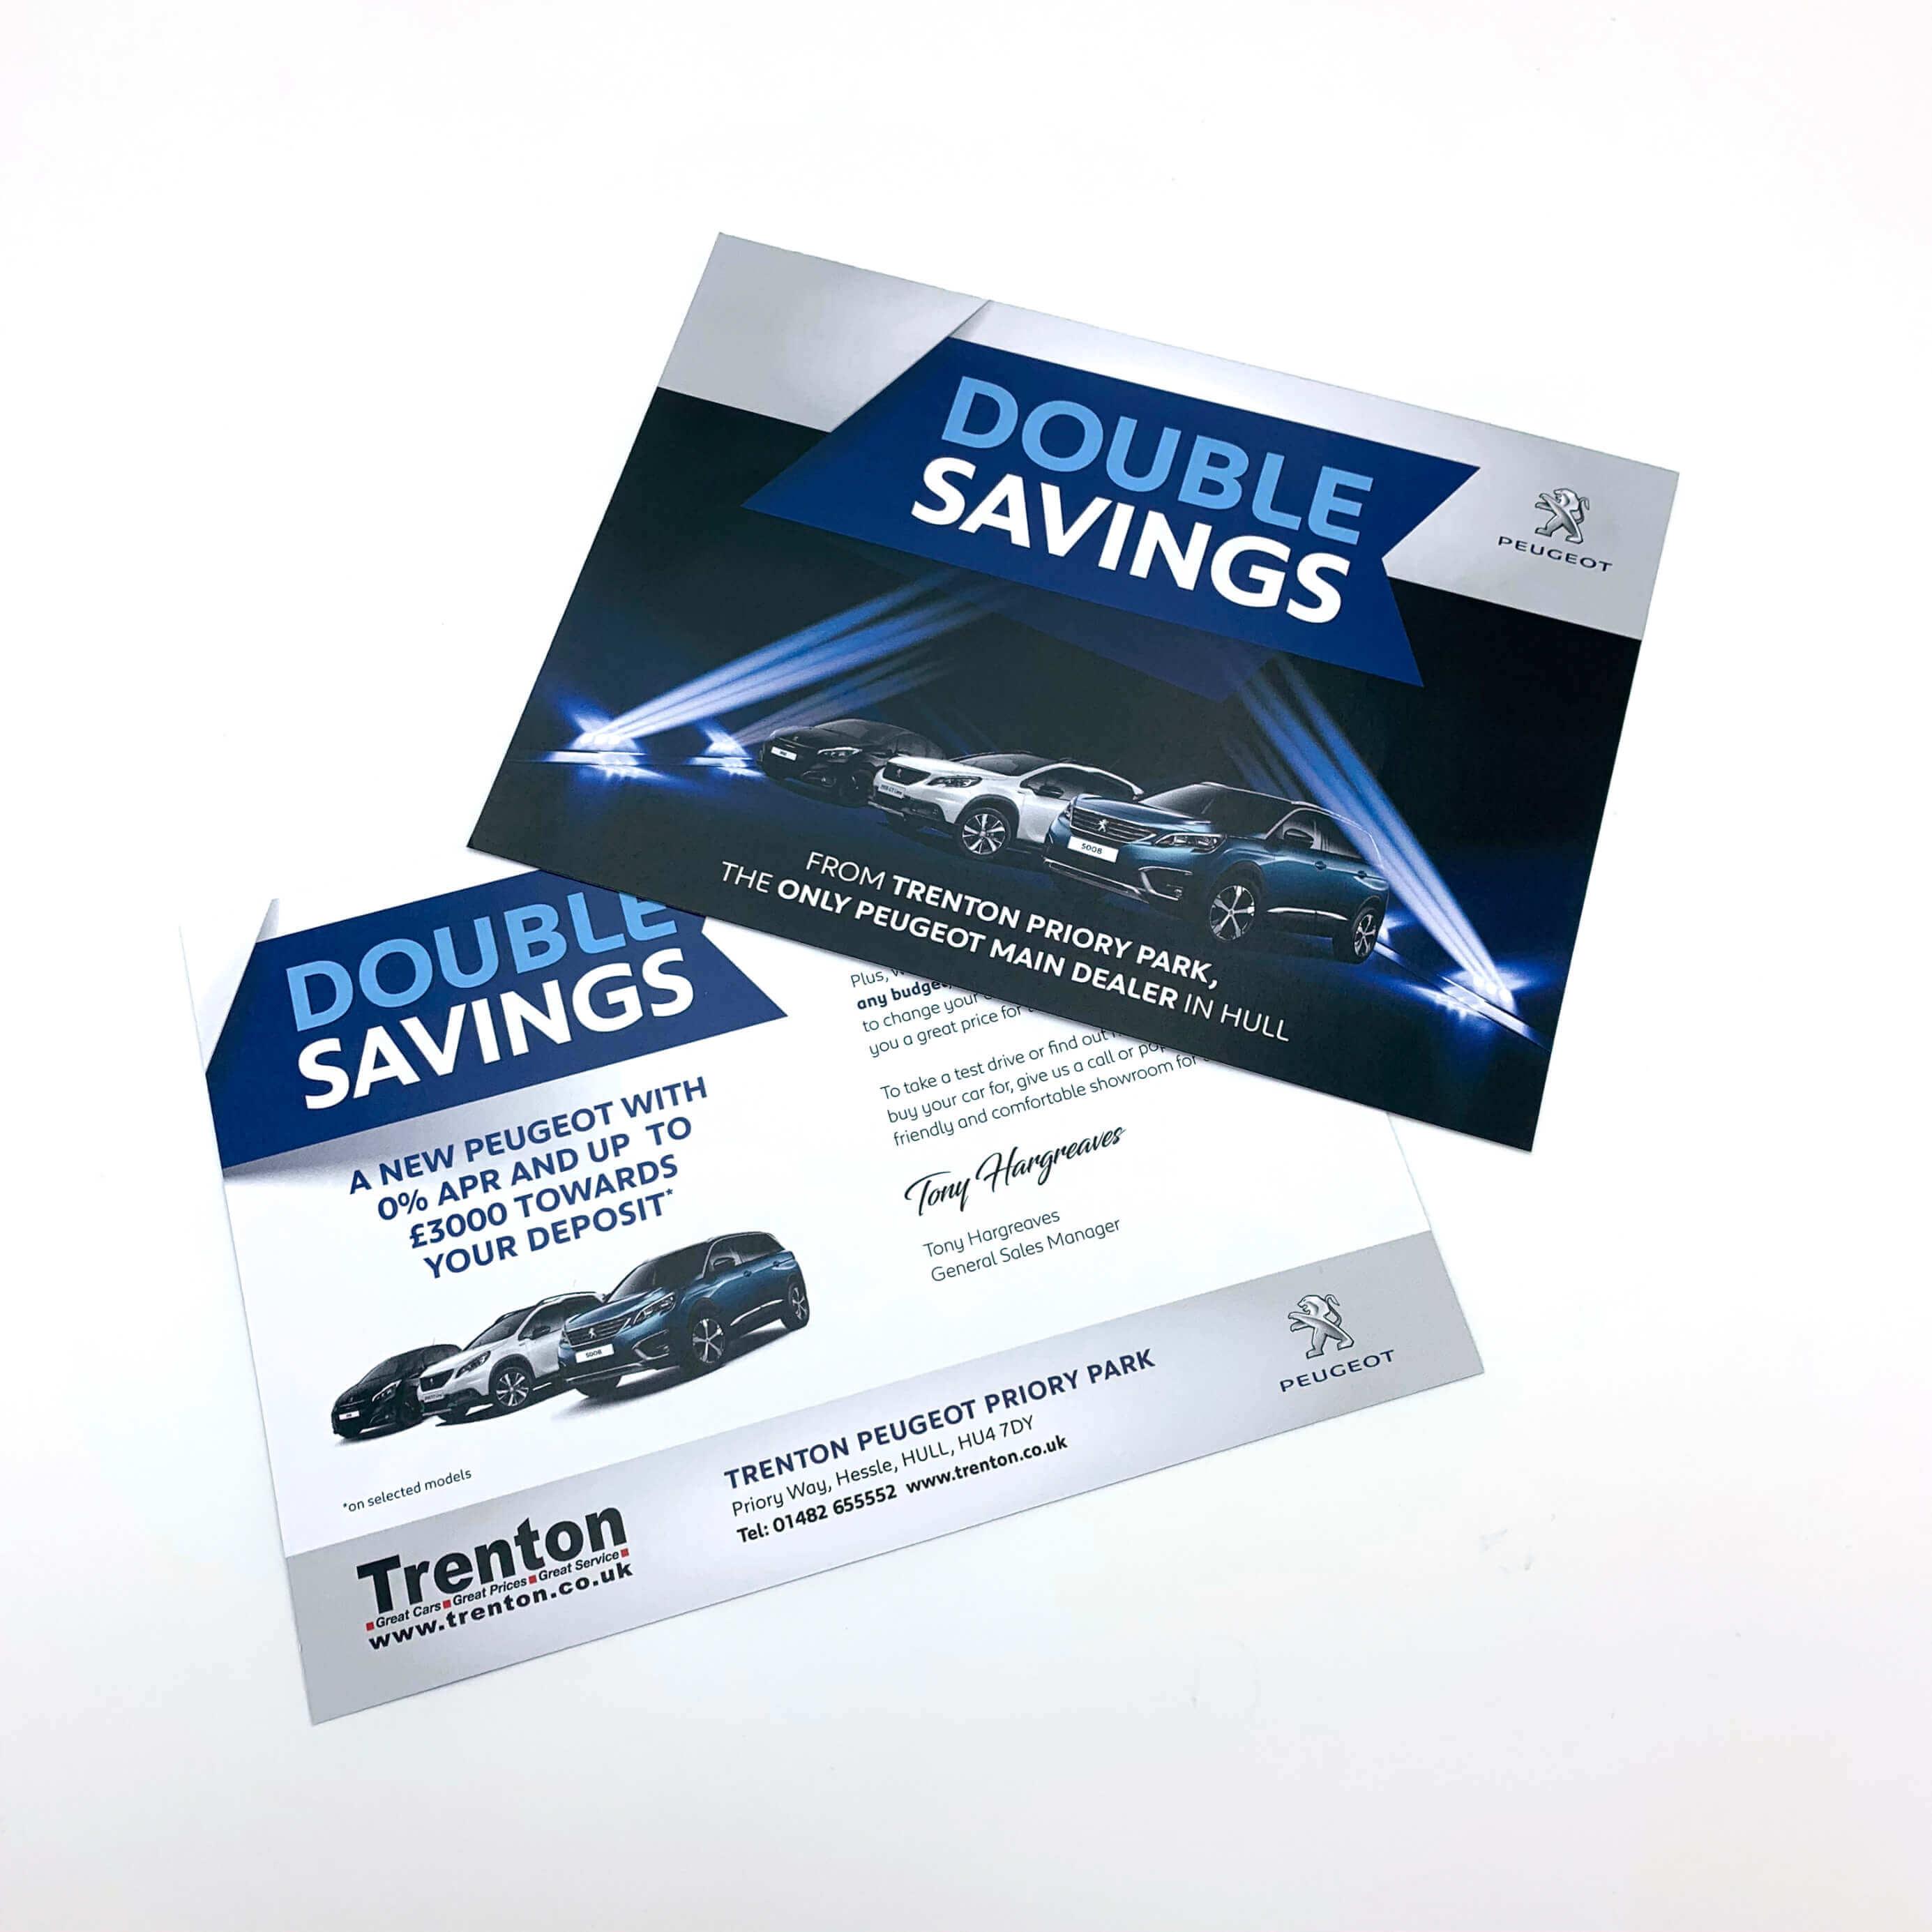 Double Savings Mailers